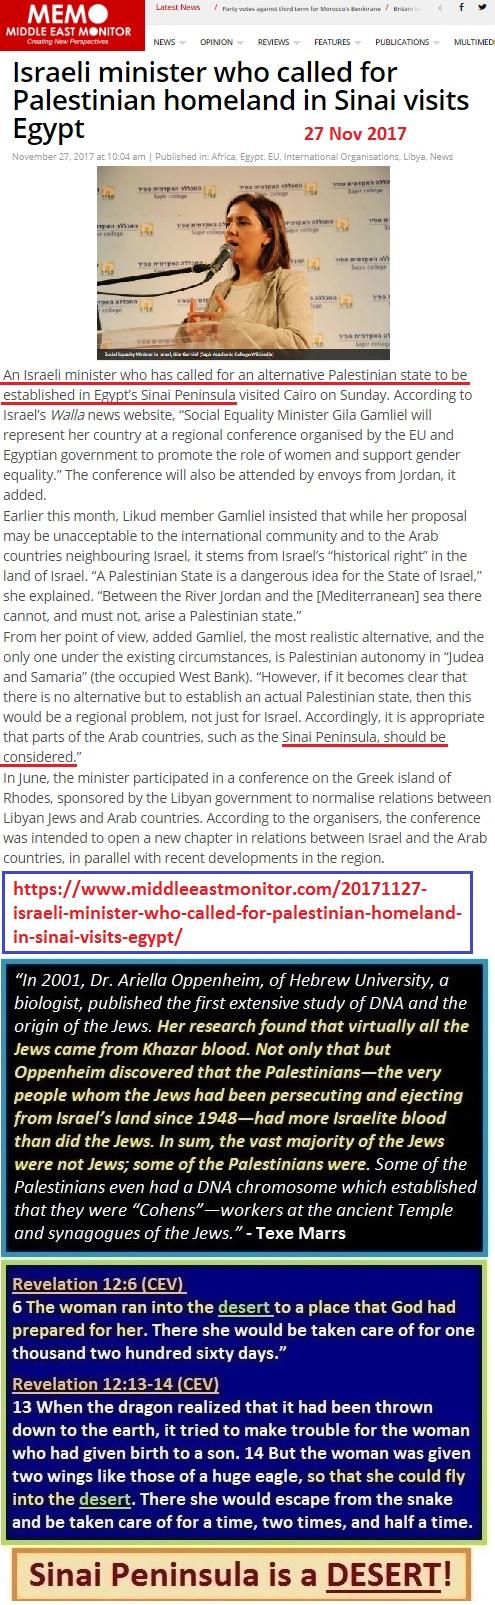 https://www.middleeastmonitor.com/20171127-israeli-minister-who-called-for-palestinian-homeland-in-sinai-visits-egypt/